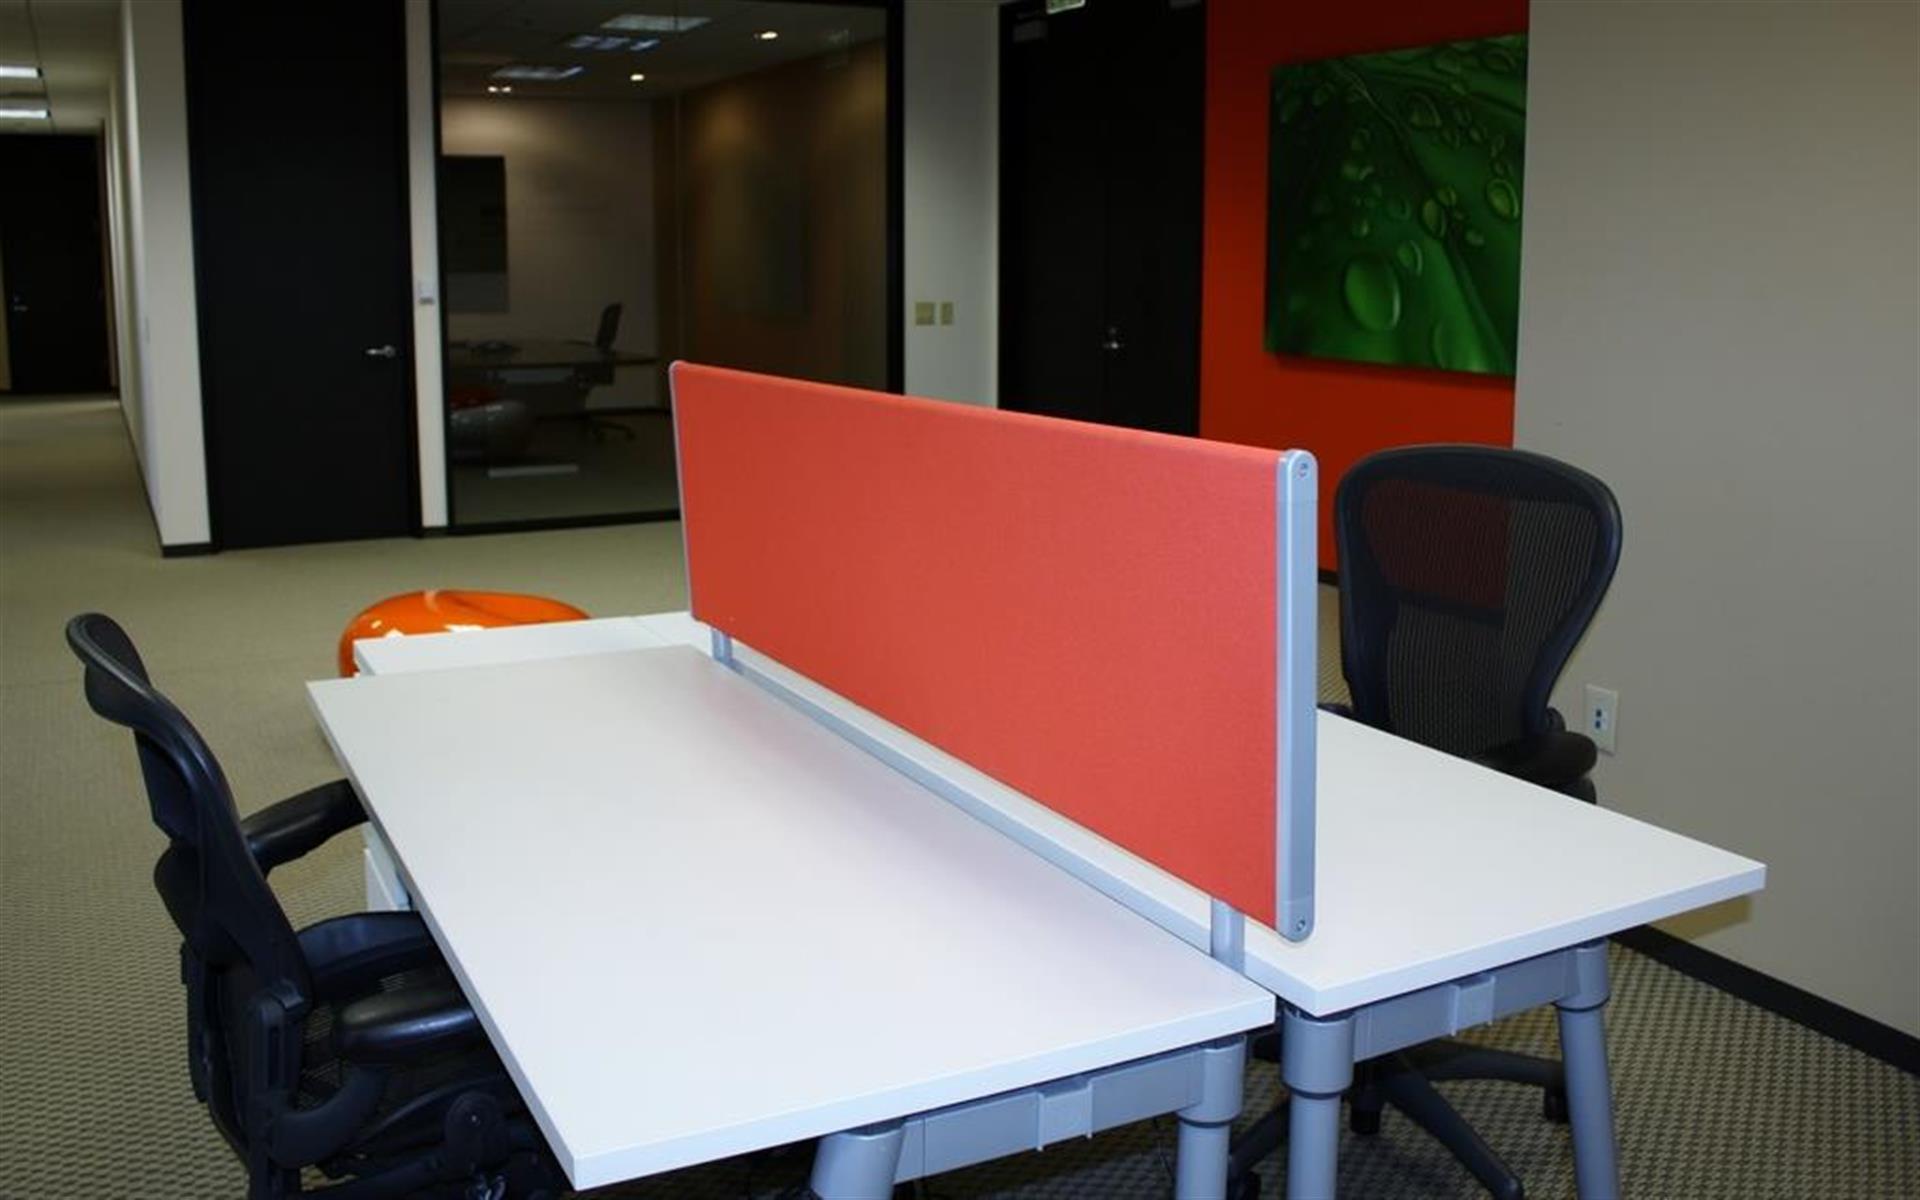 Innovation Capital Law Group - Dedicated Desk